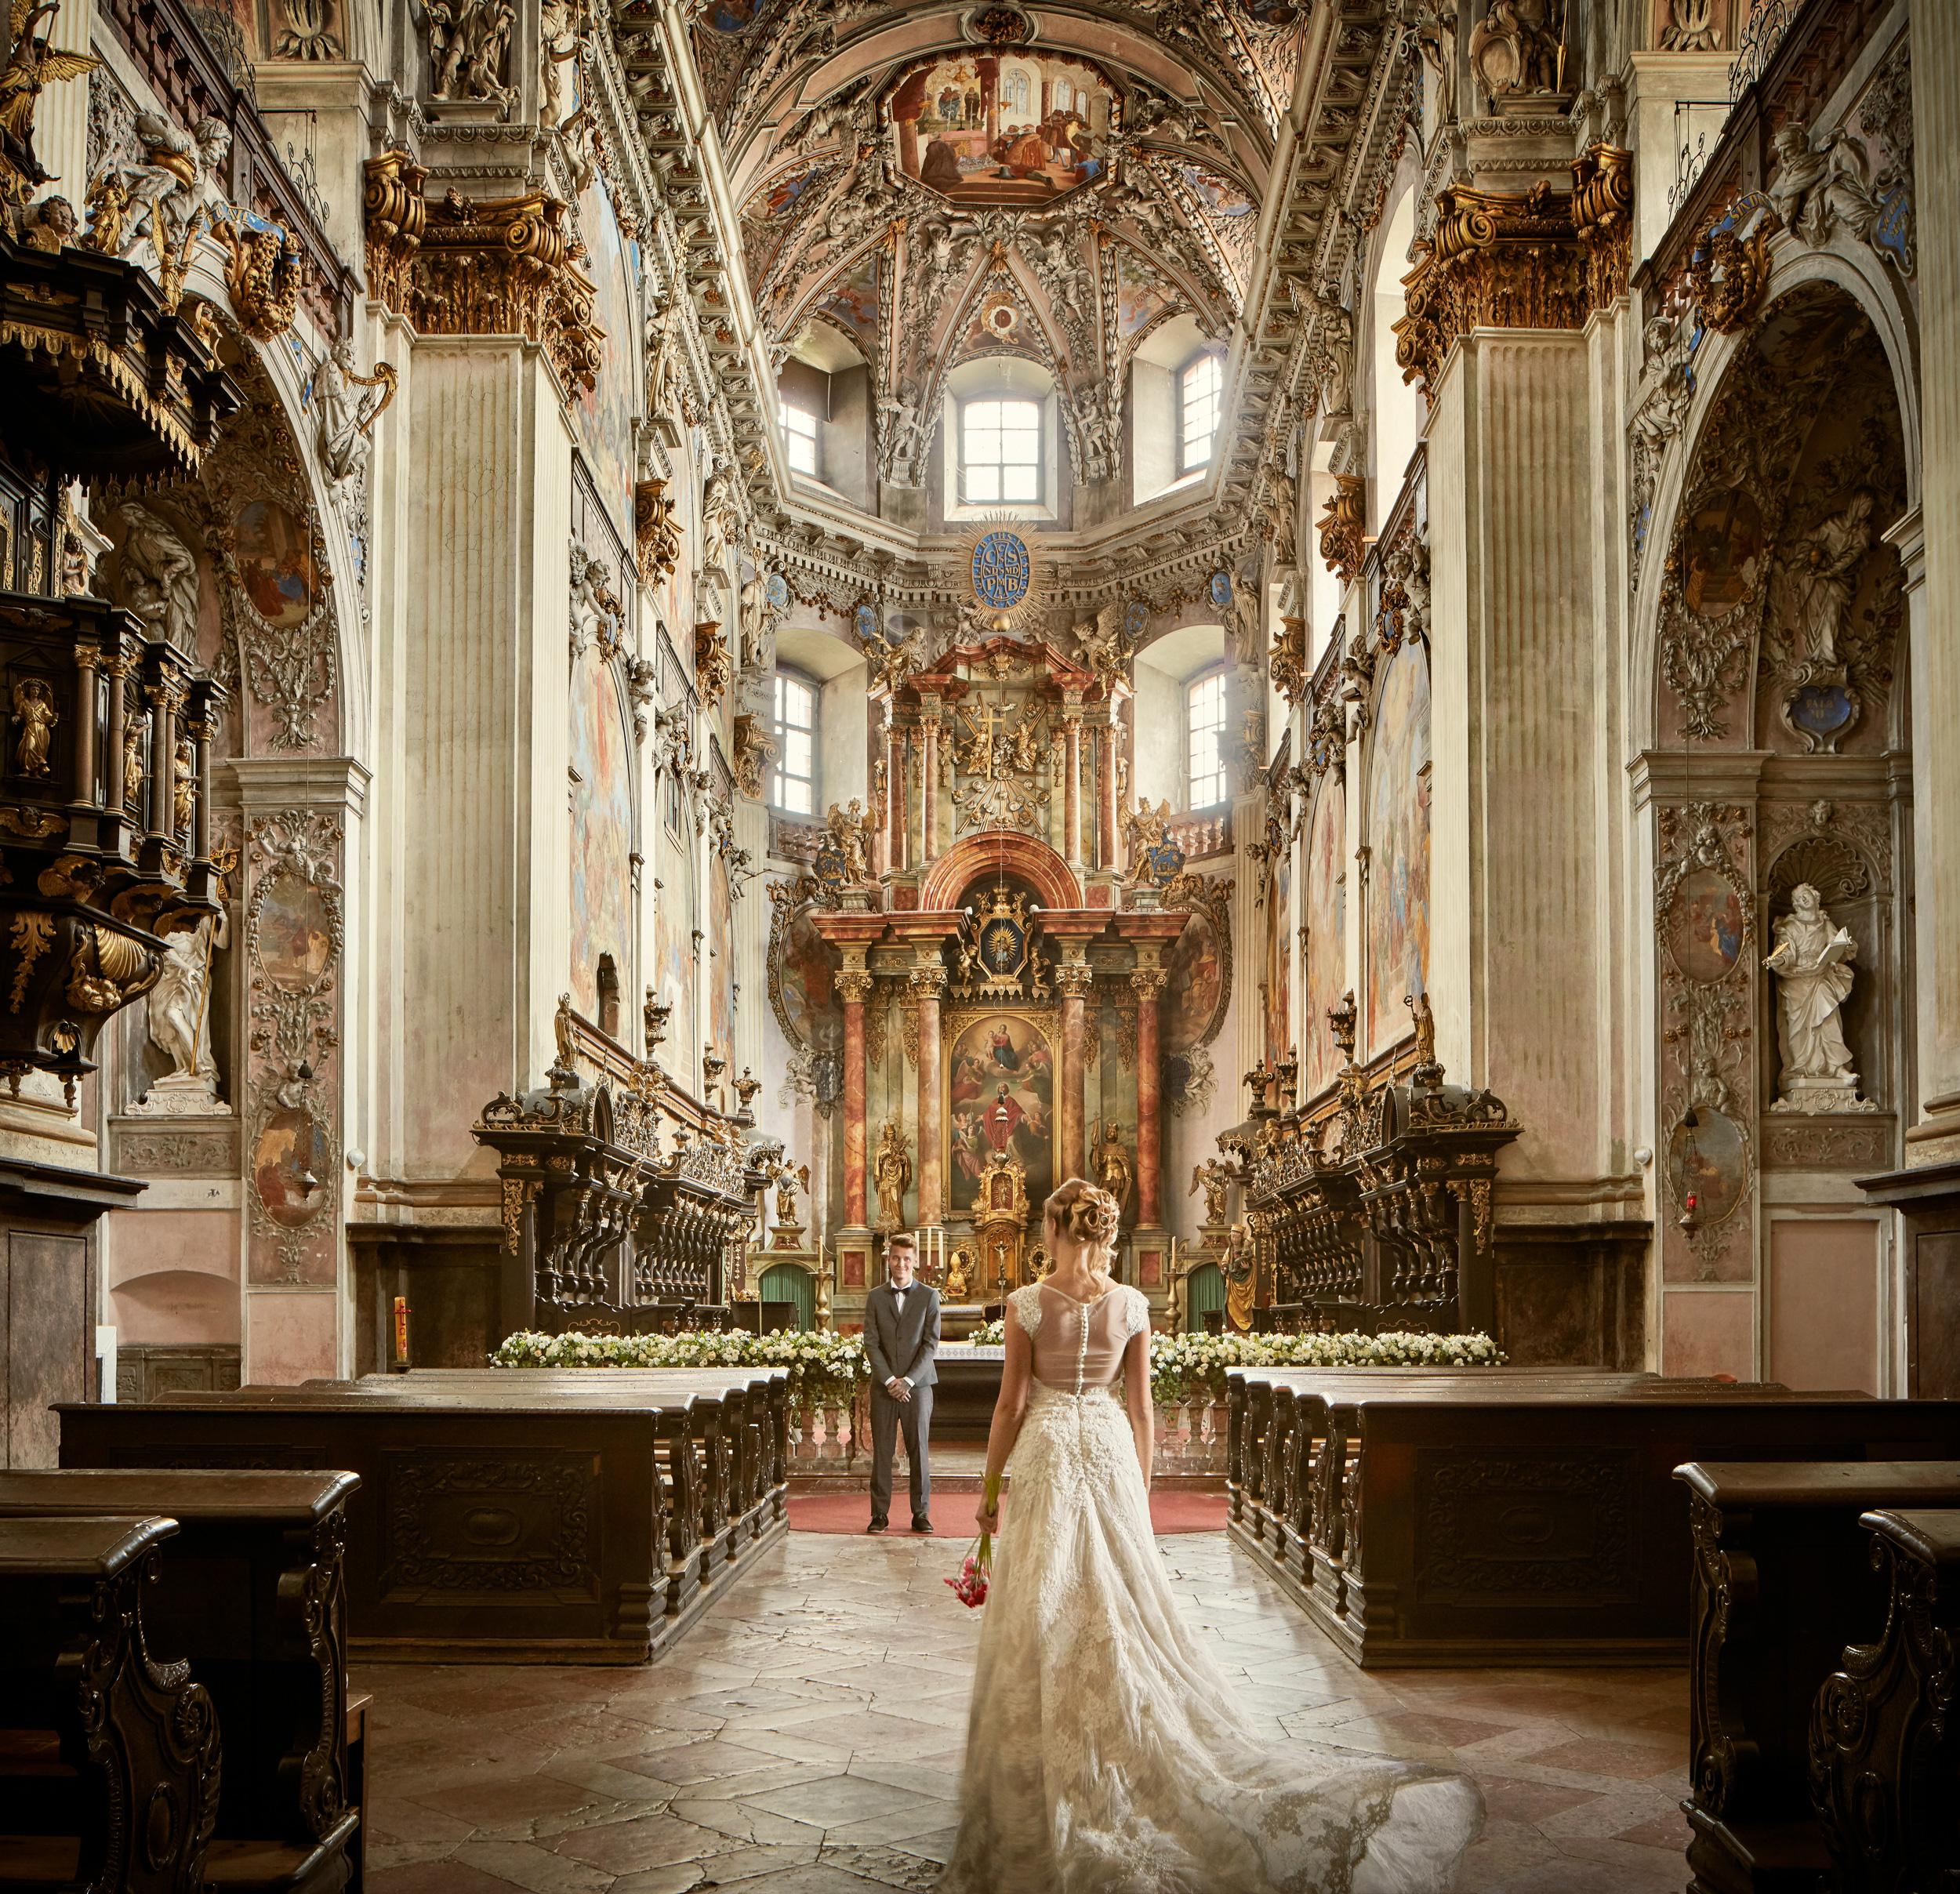 18-26-broumov-Kostel.jpg